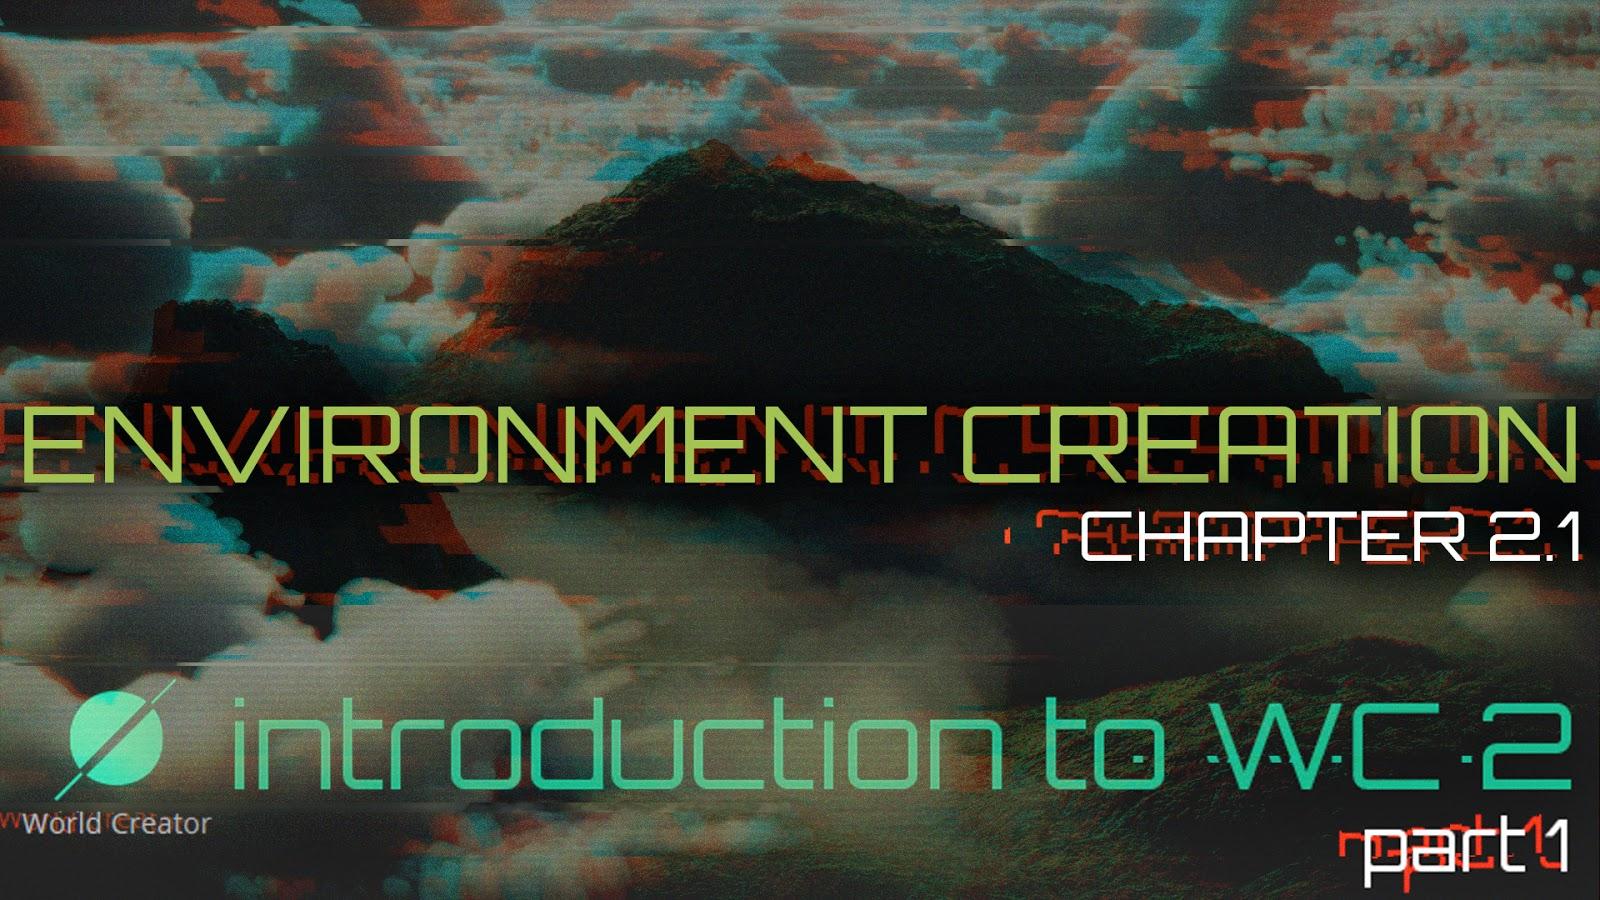 introduction_wc2_p1.jpg